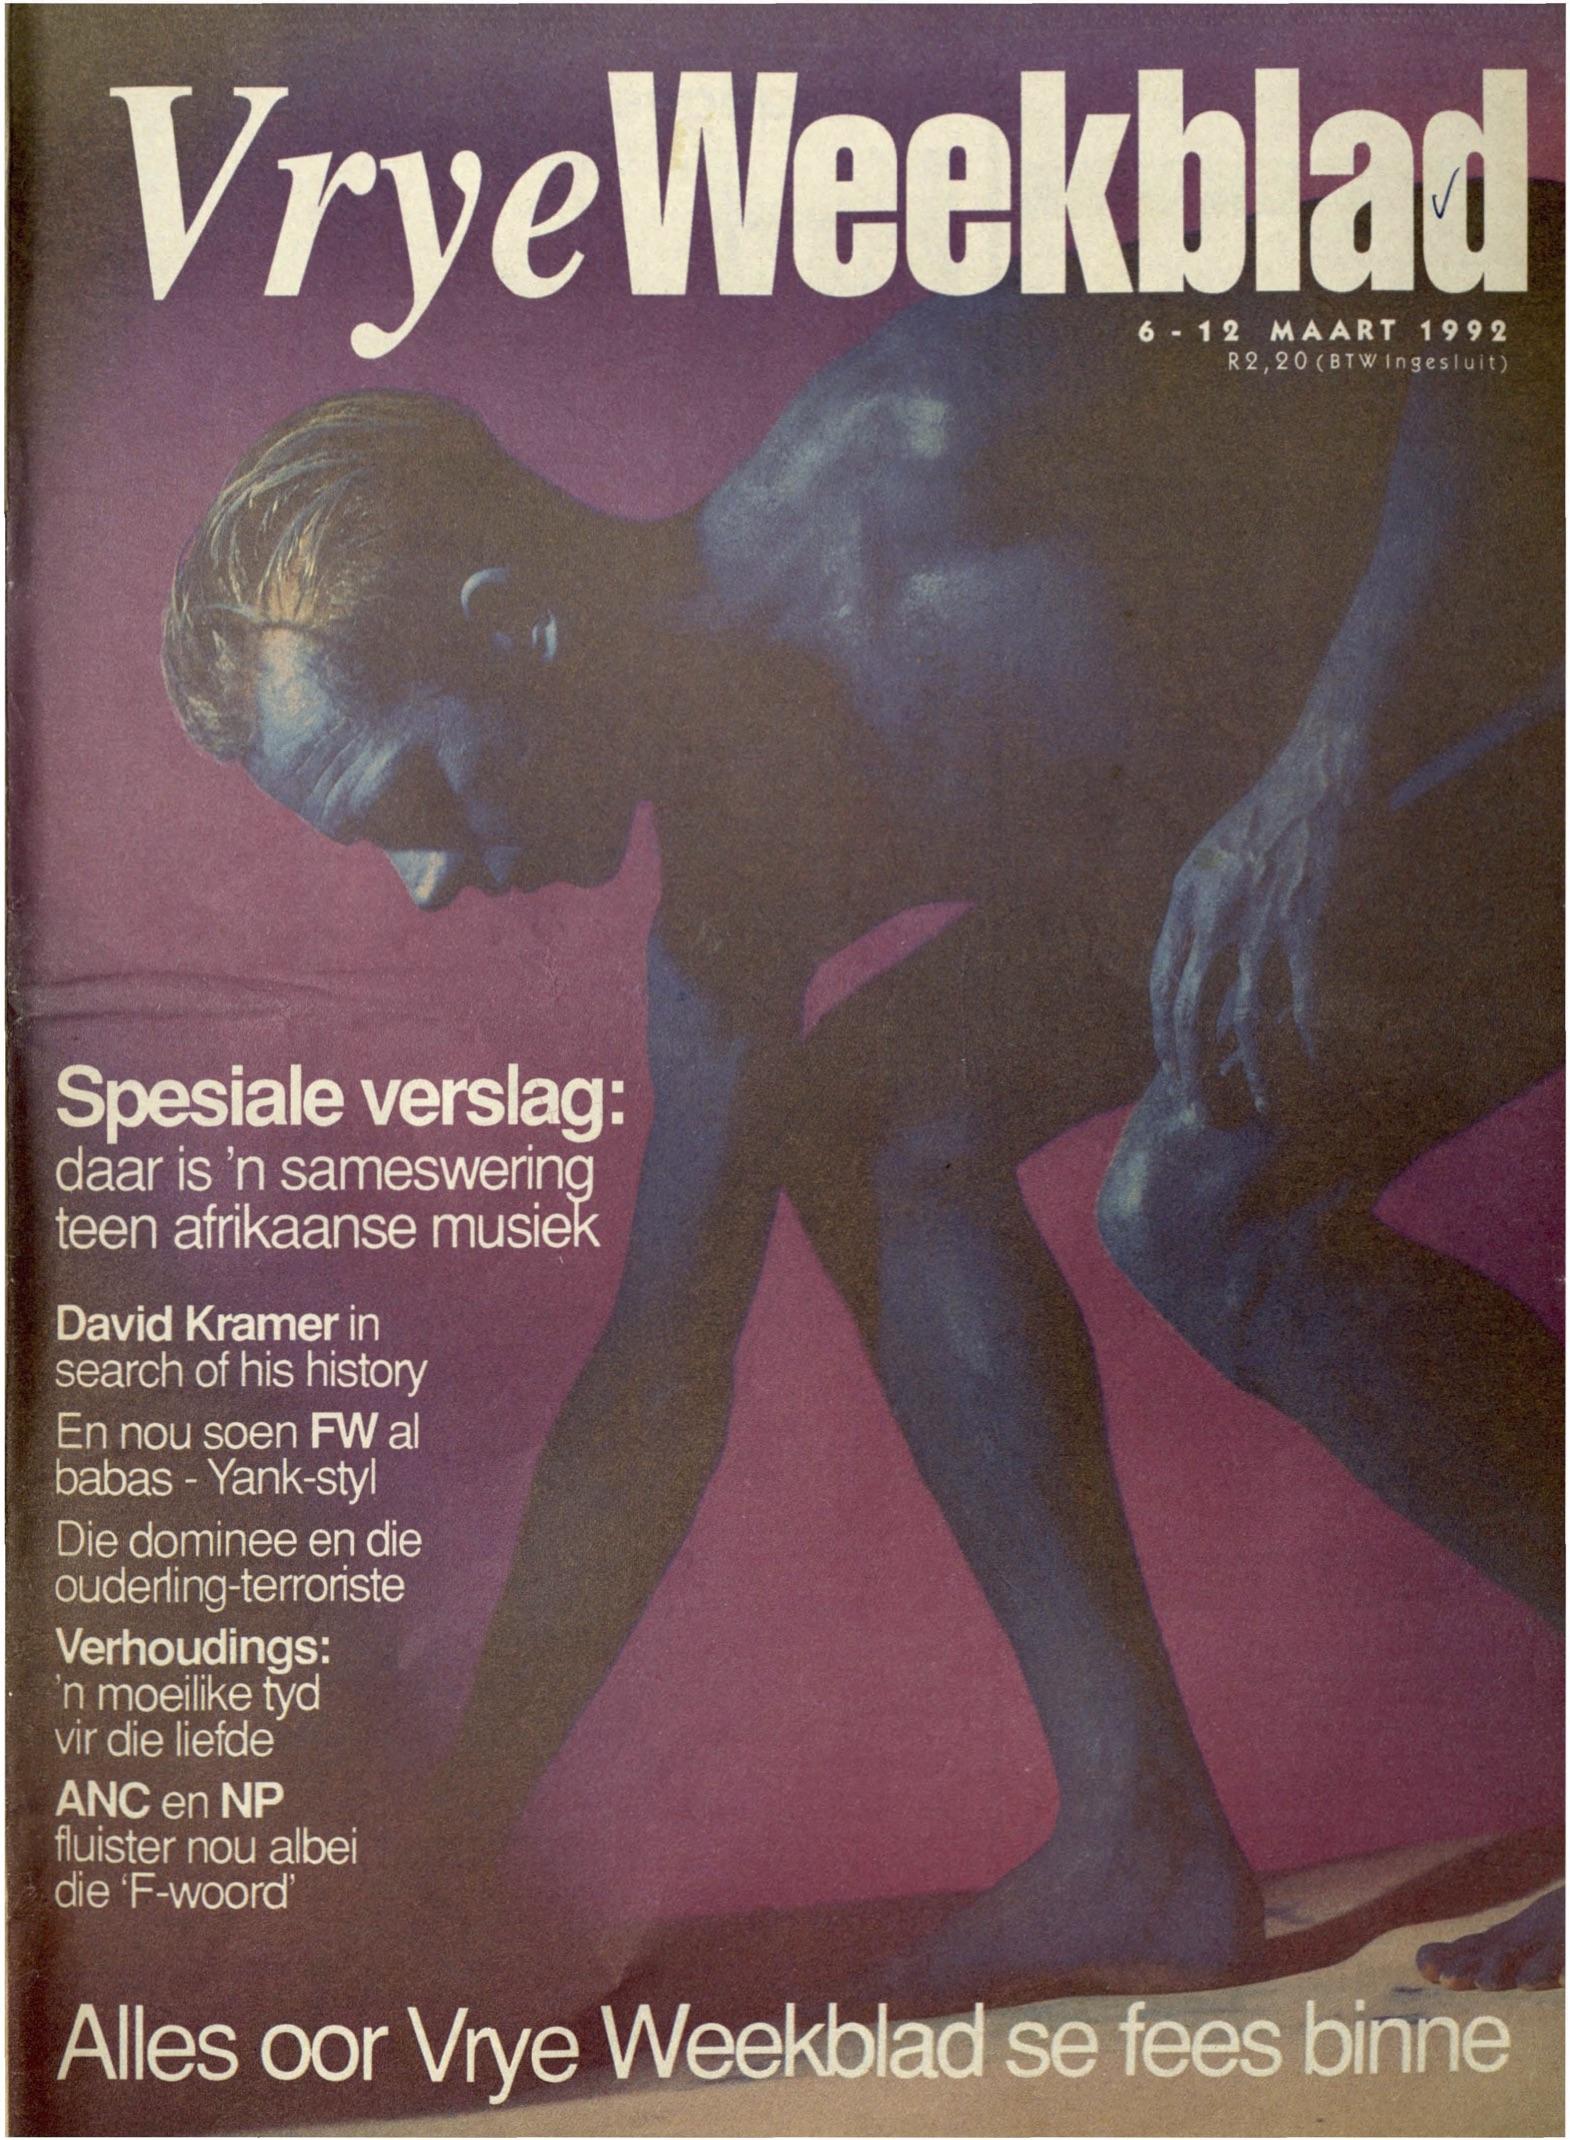 vw_1992-03-06-12.jpg